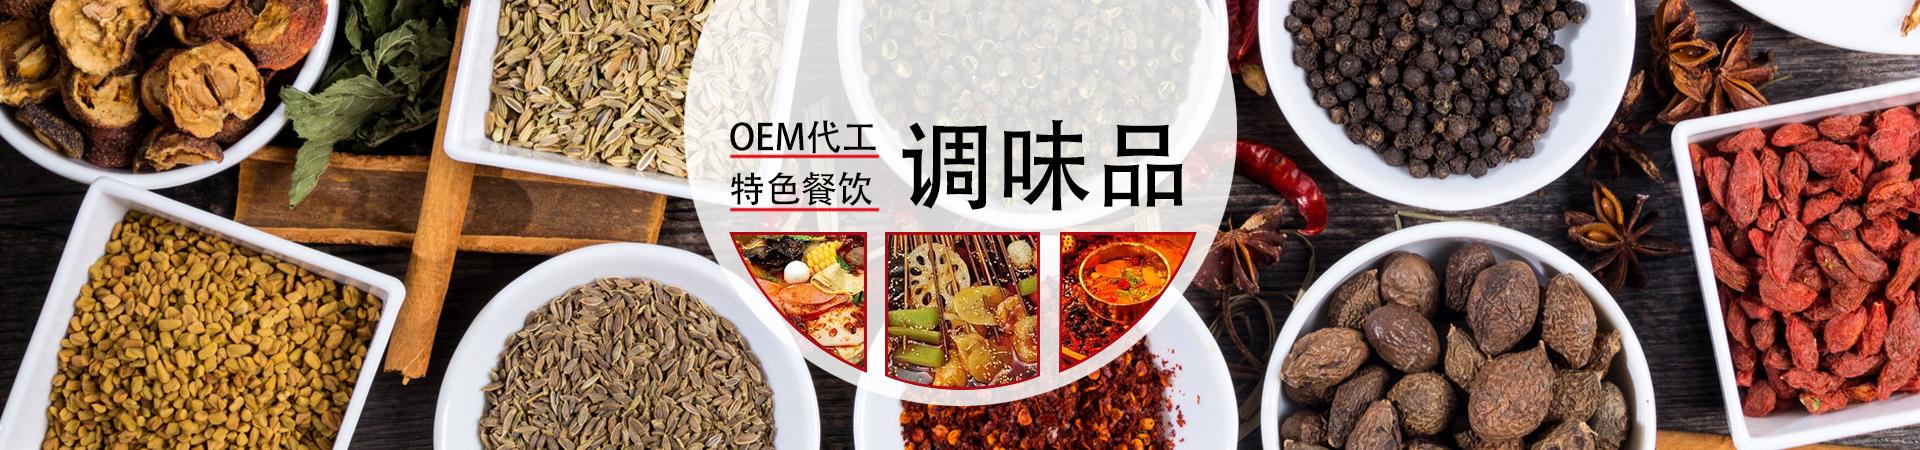 http://www.huachangweiye.com/data/upload/202105/20210504105025_436.jpg